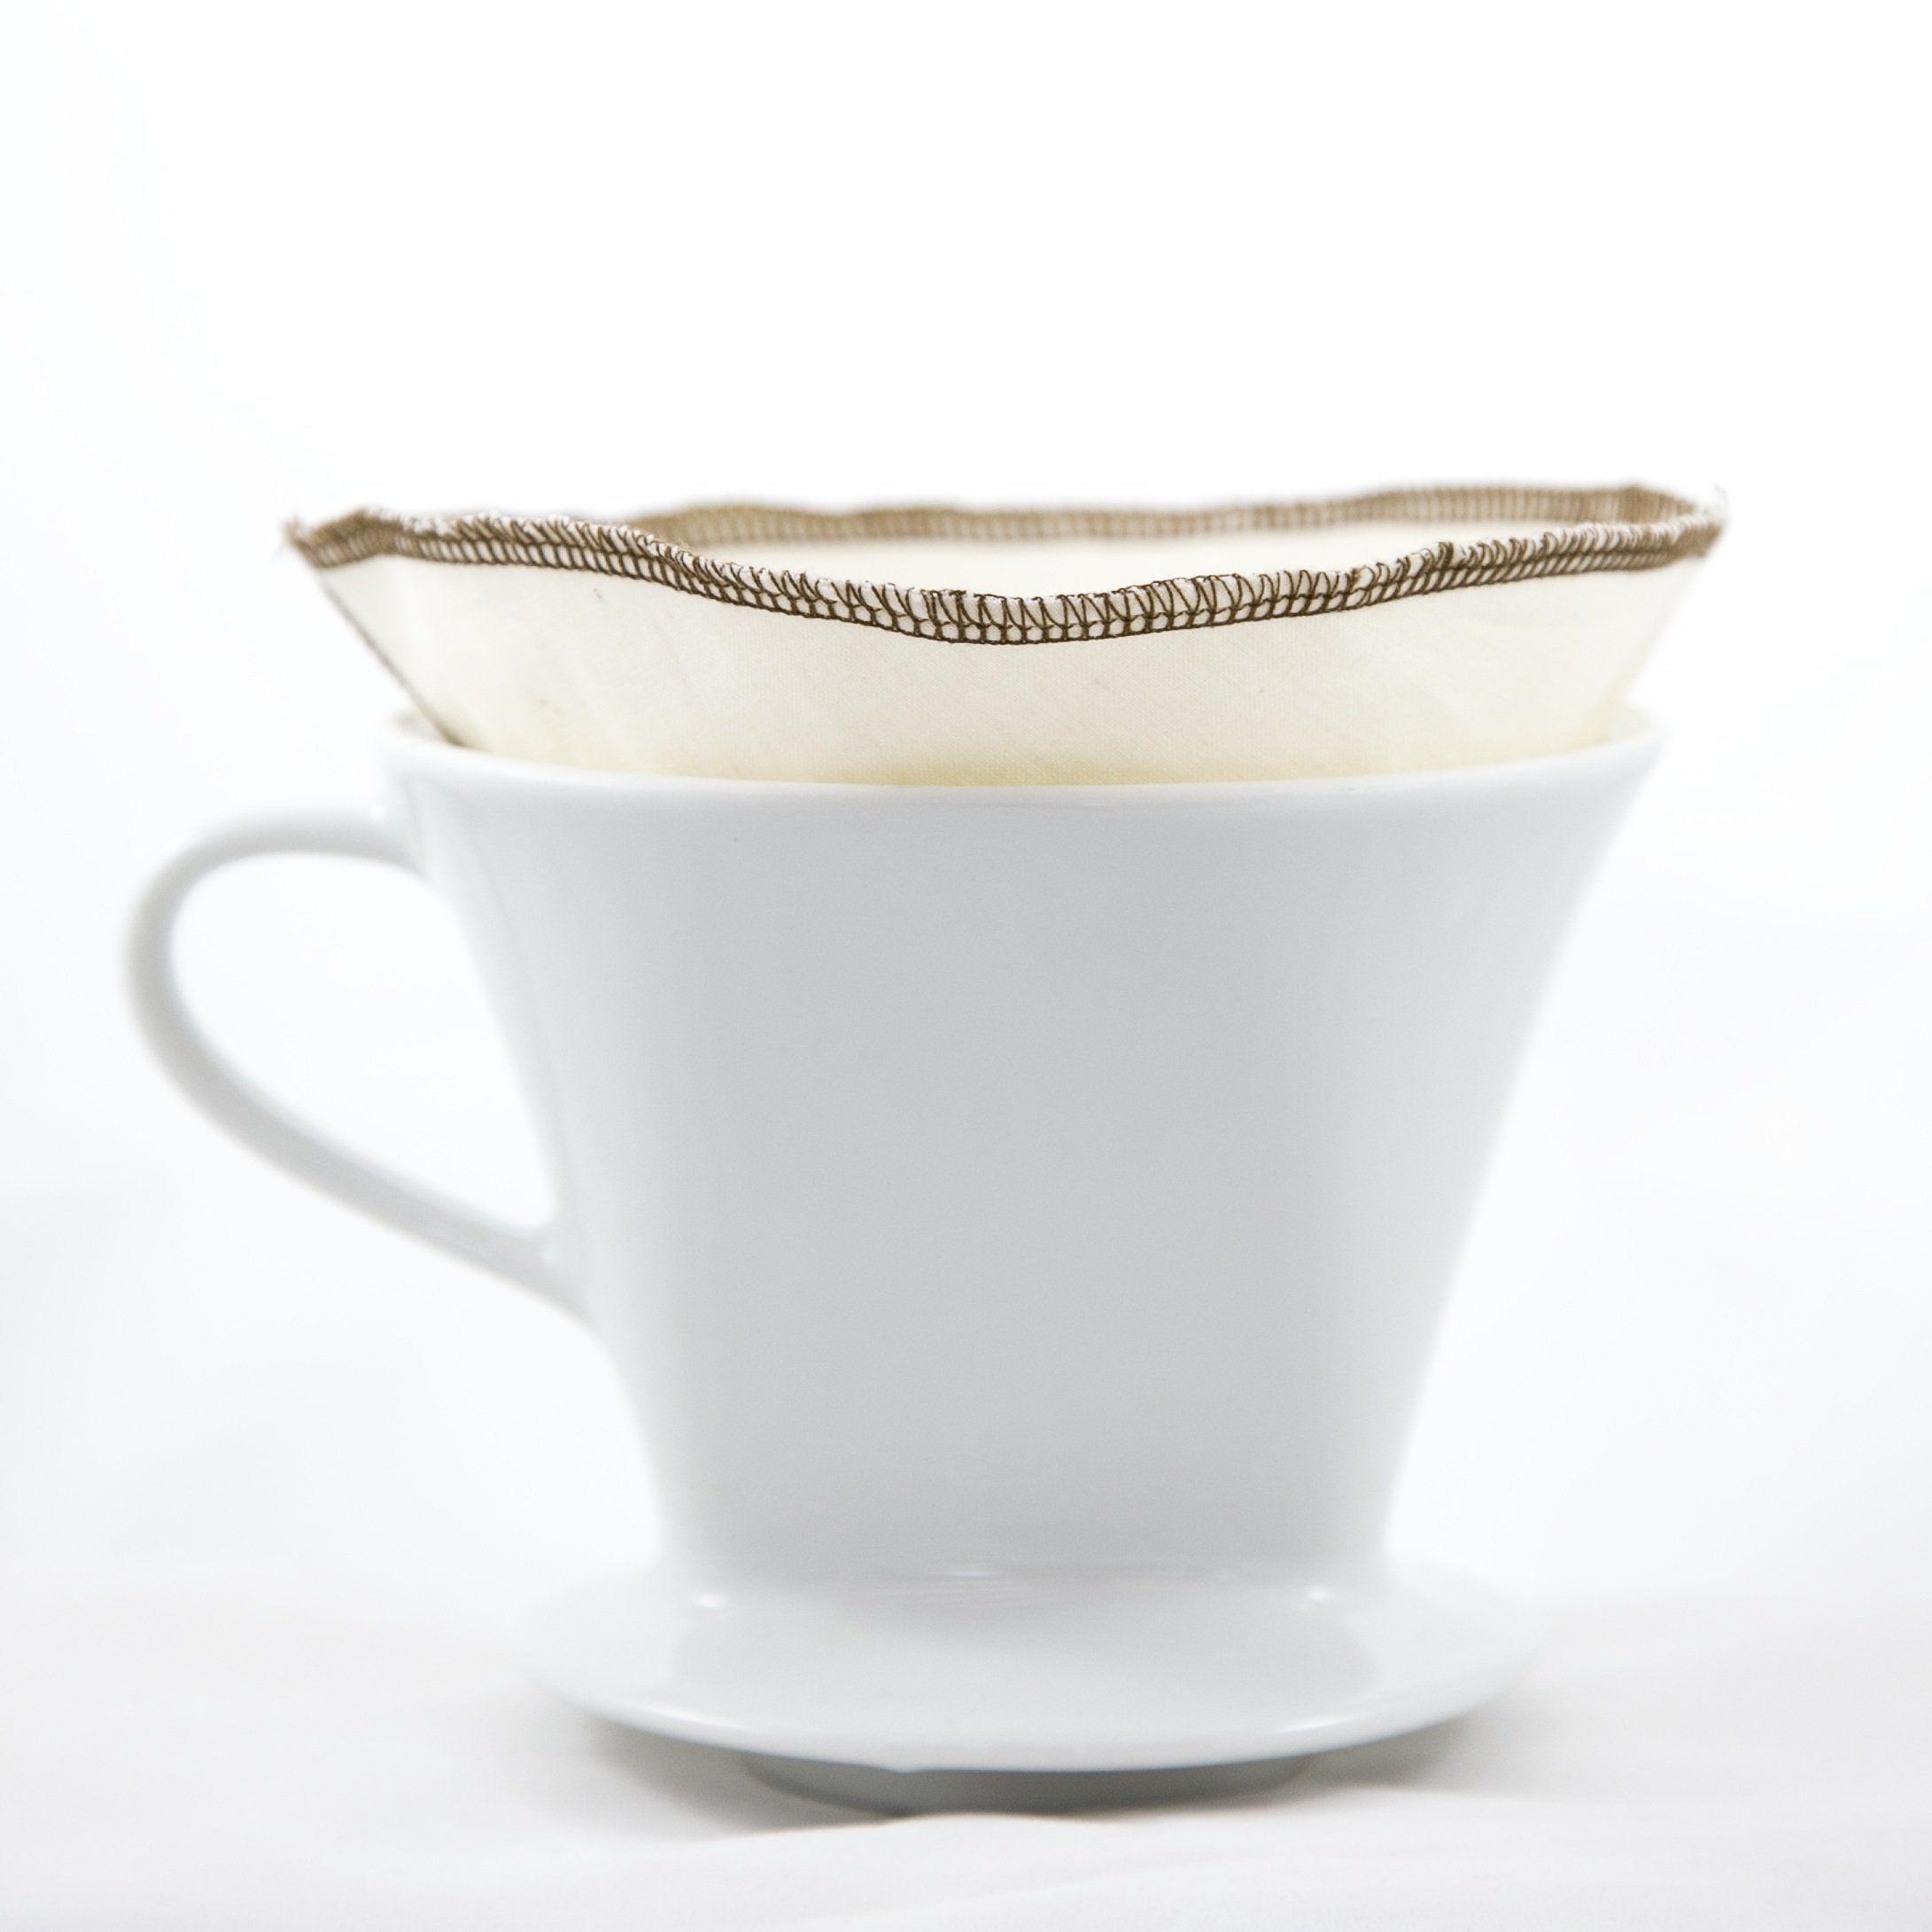 Cone Coffee Filter Coffee filter holder, Coffee filters